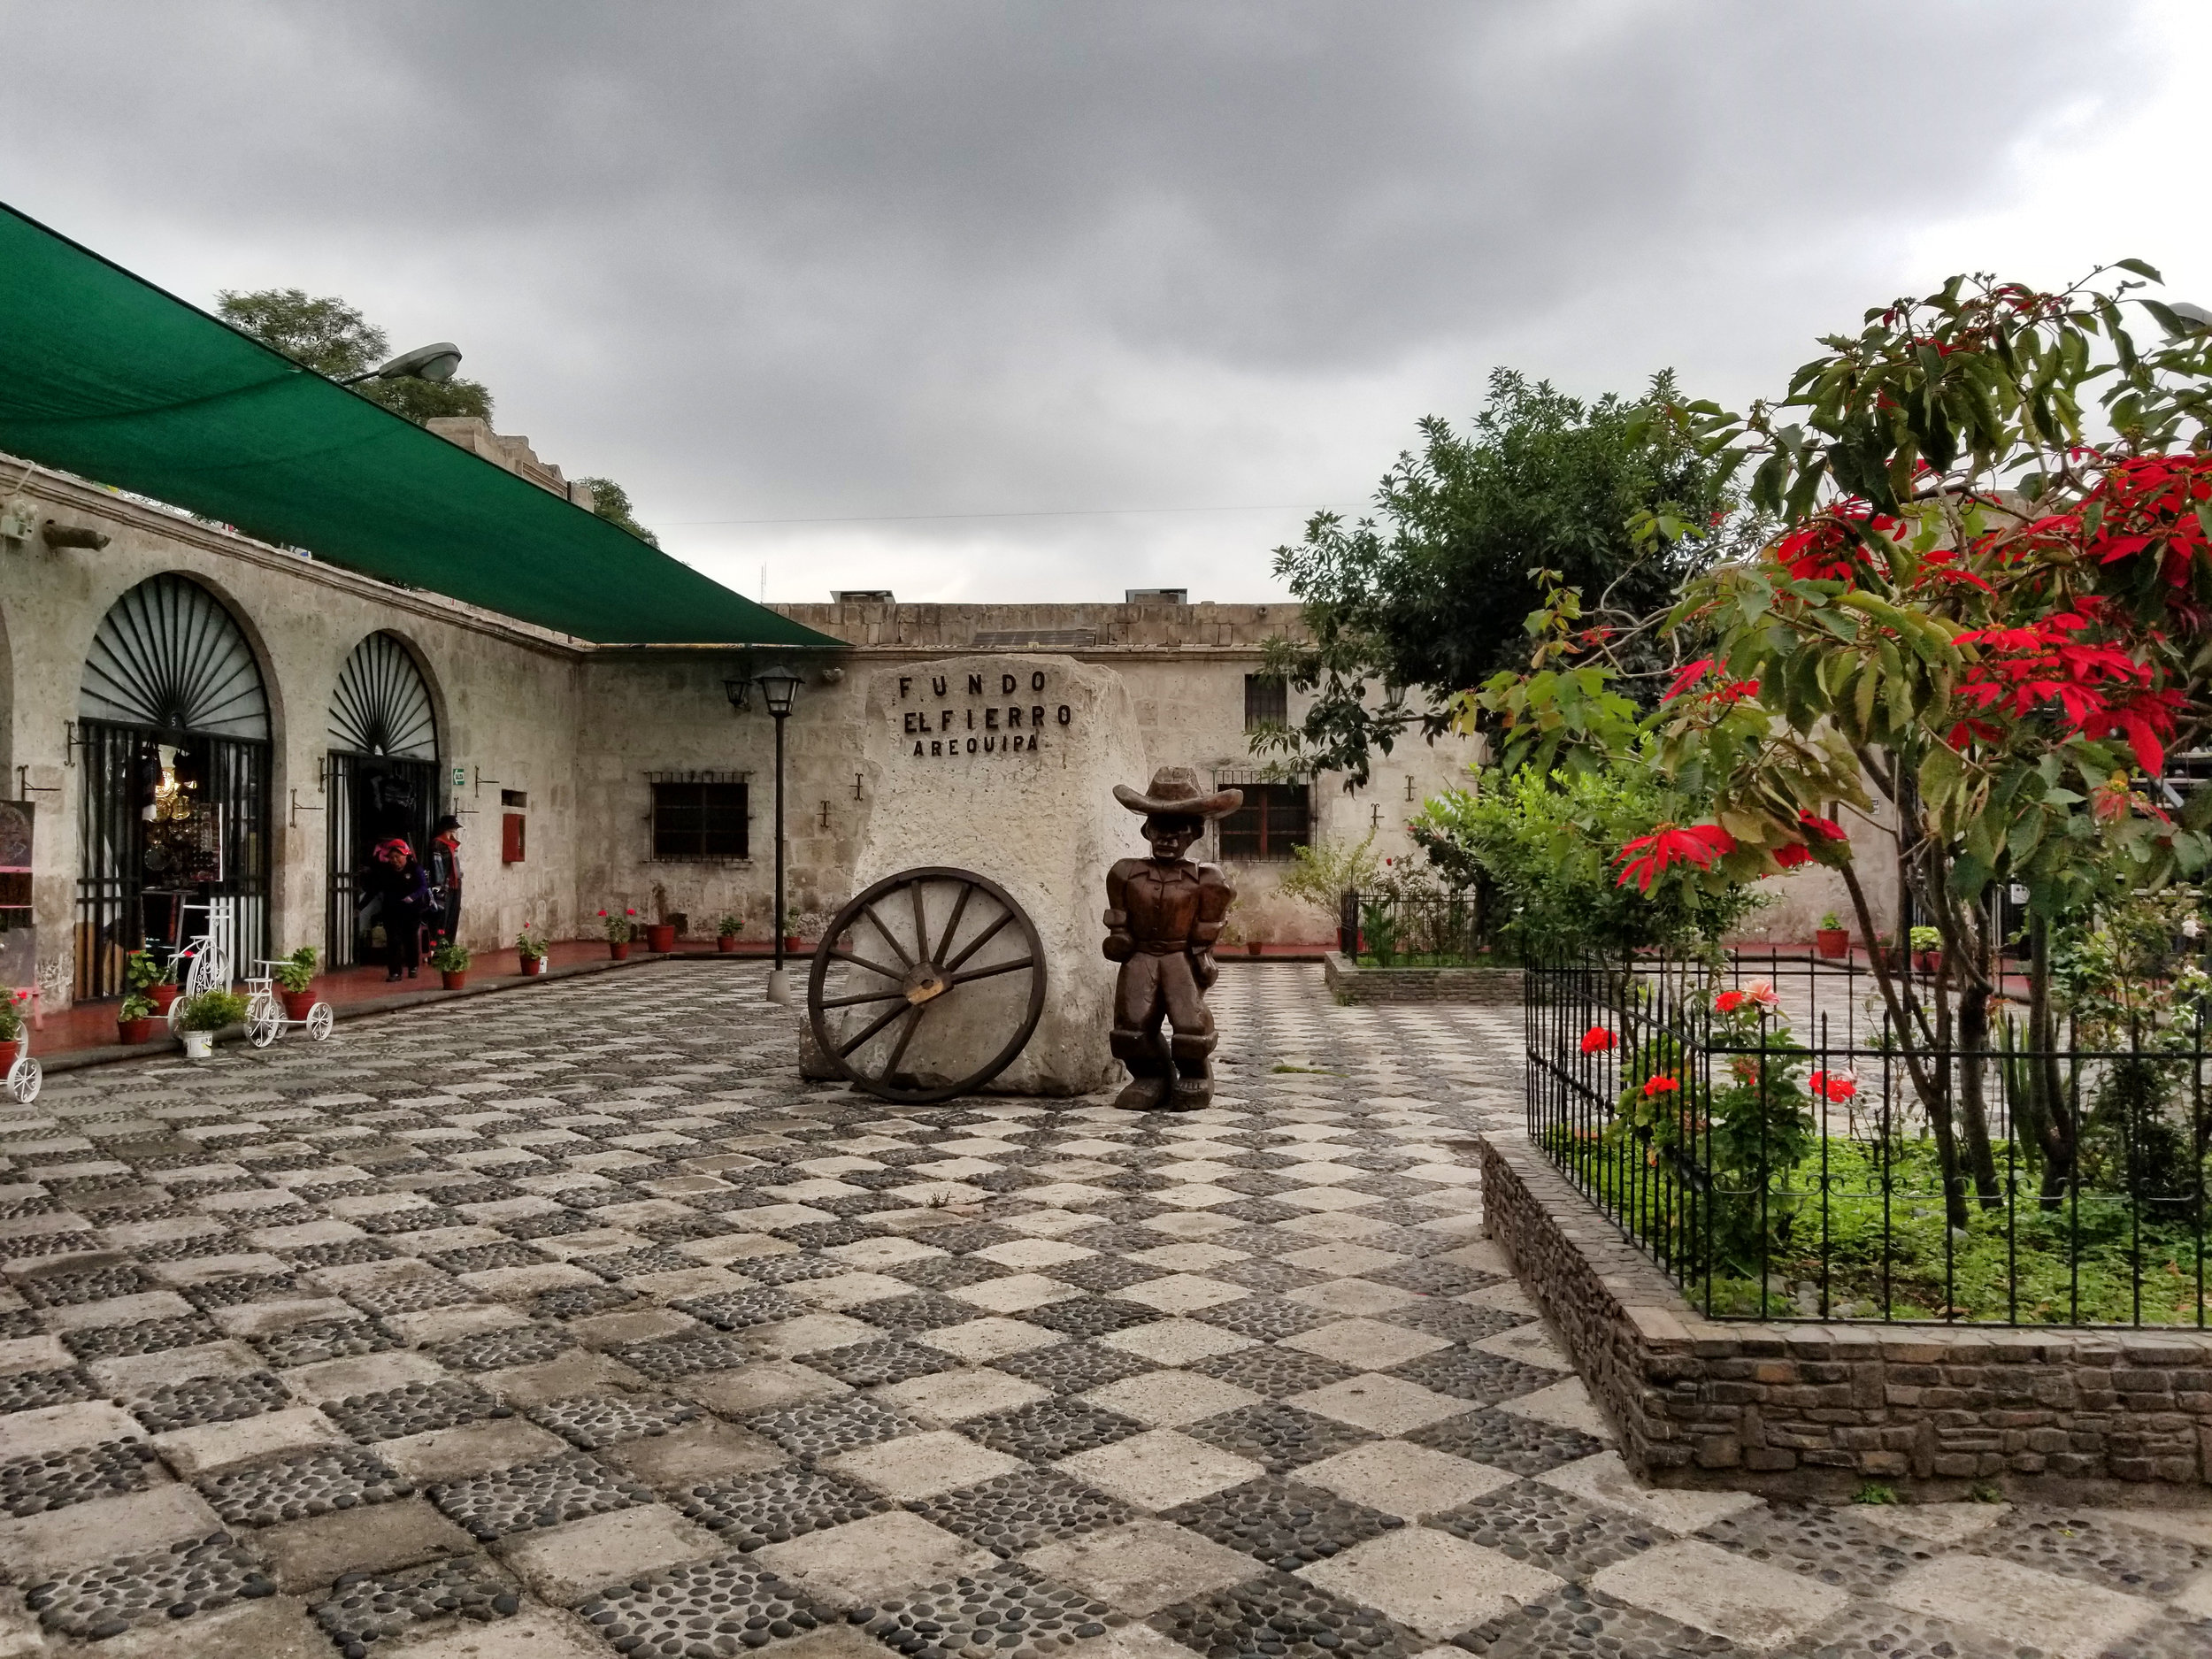 Fundo El Fierro Arequipa